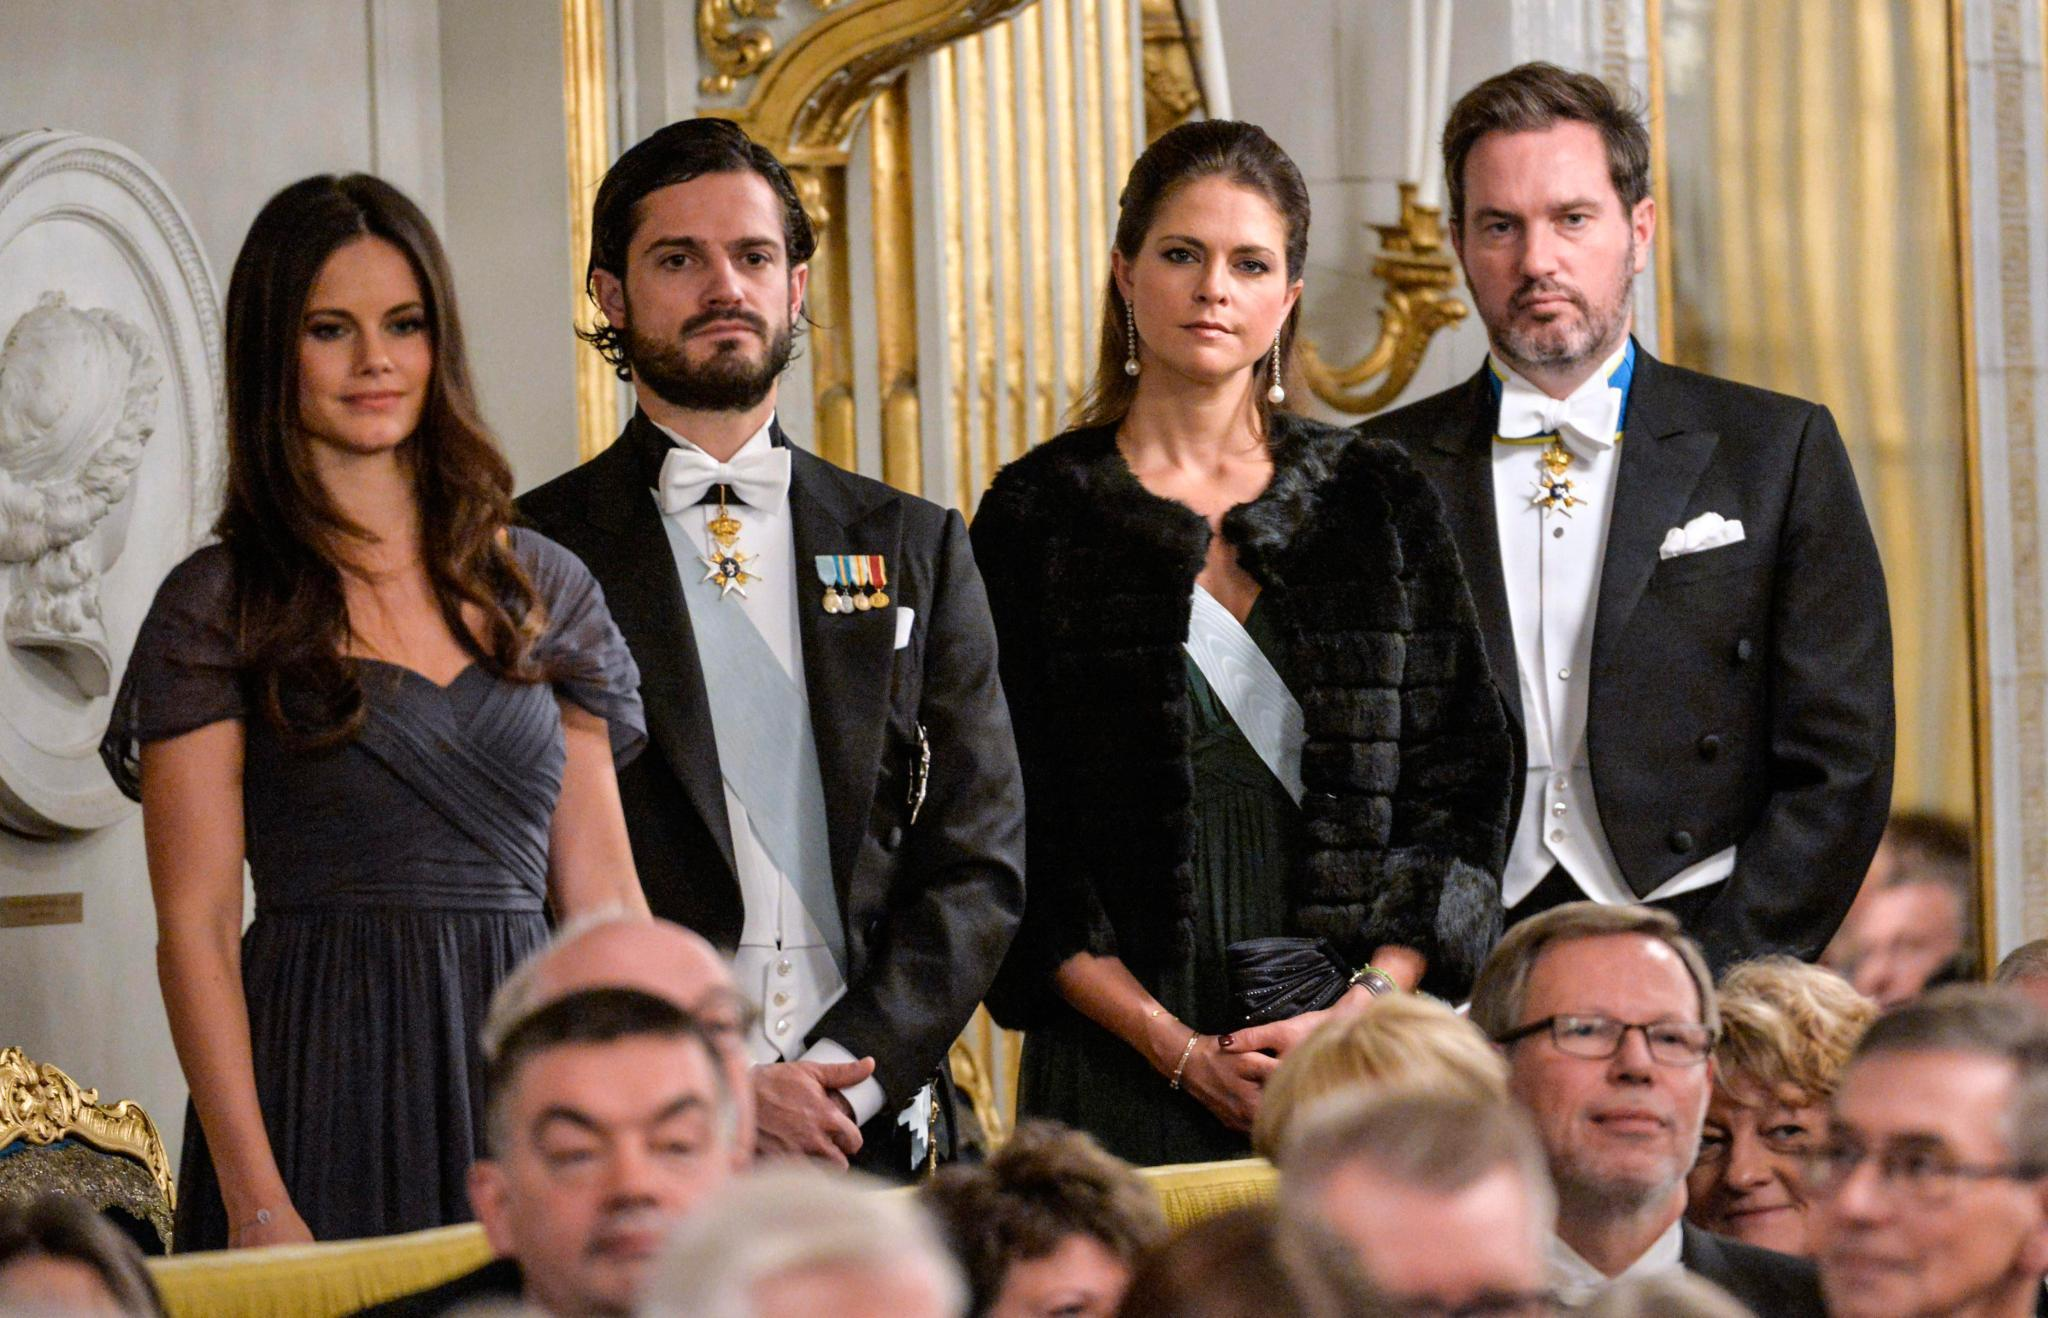 Sofia Hellqvist, Prinz Carl Philip, Prinzessin Madeleine, Chris O'Neill